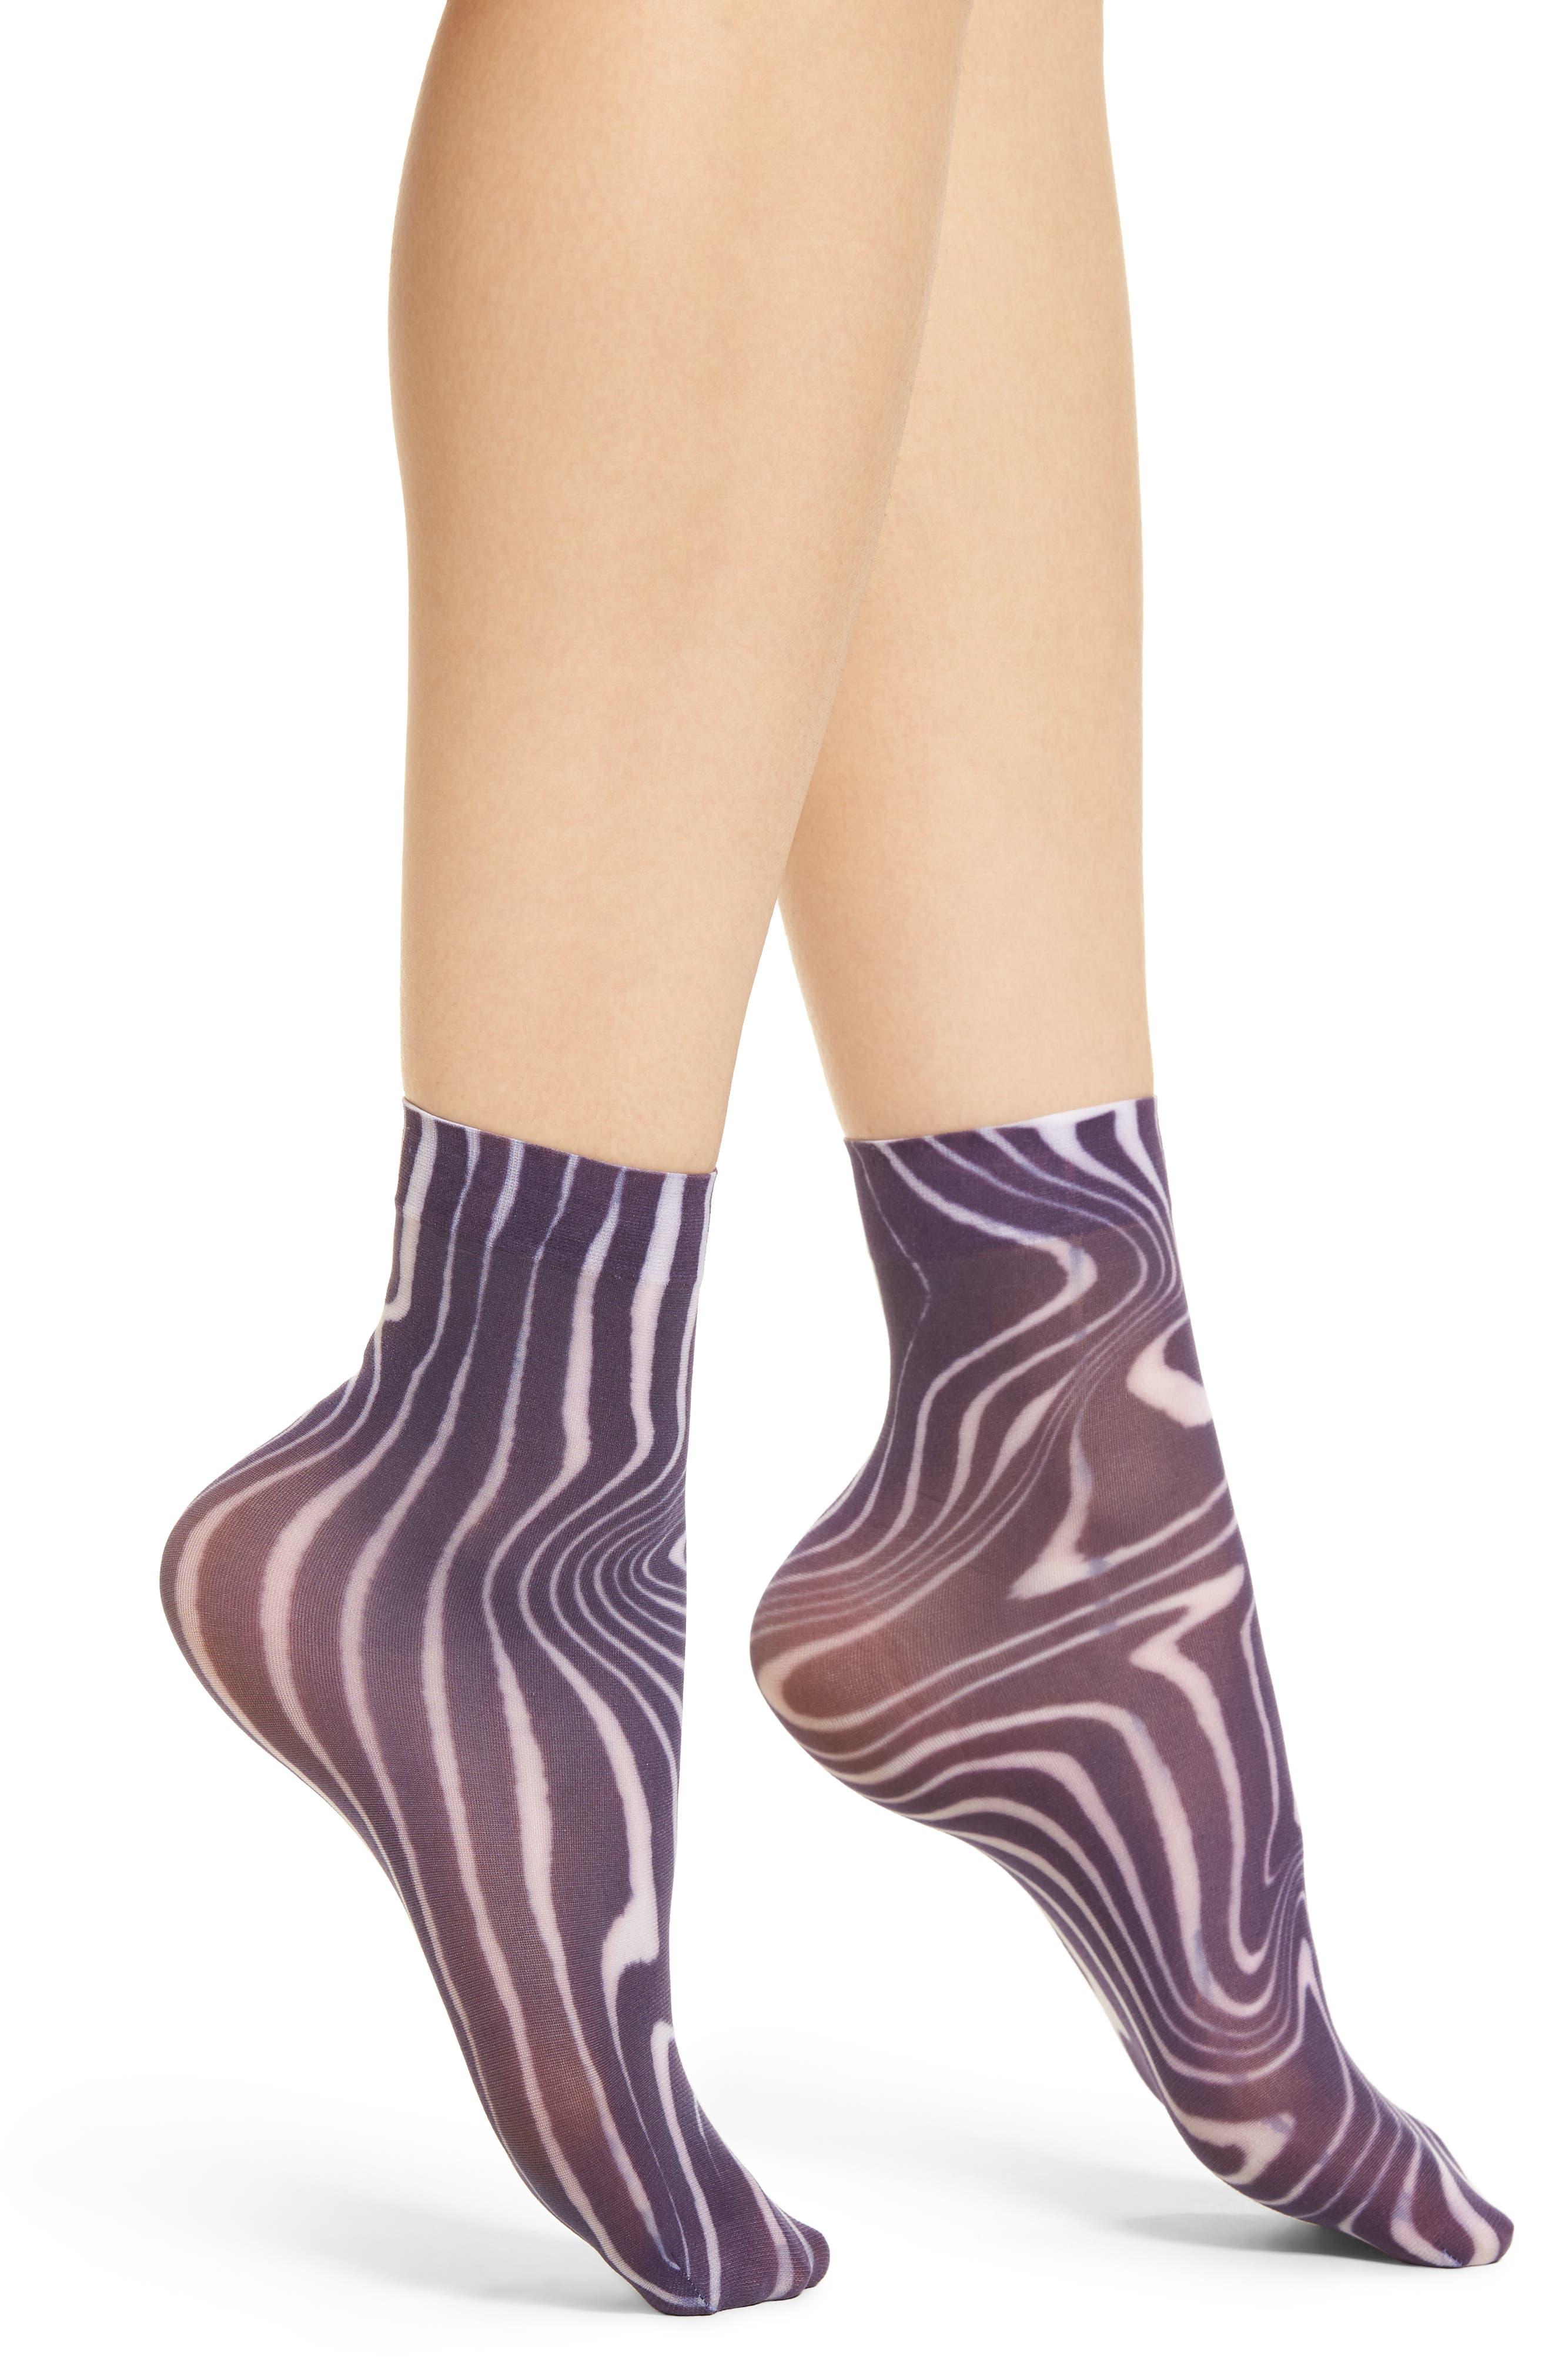 Hysteria Mia Ankle Socks